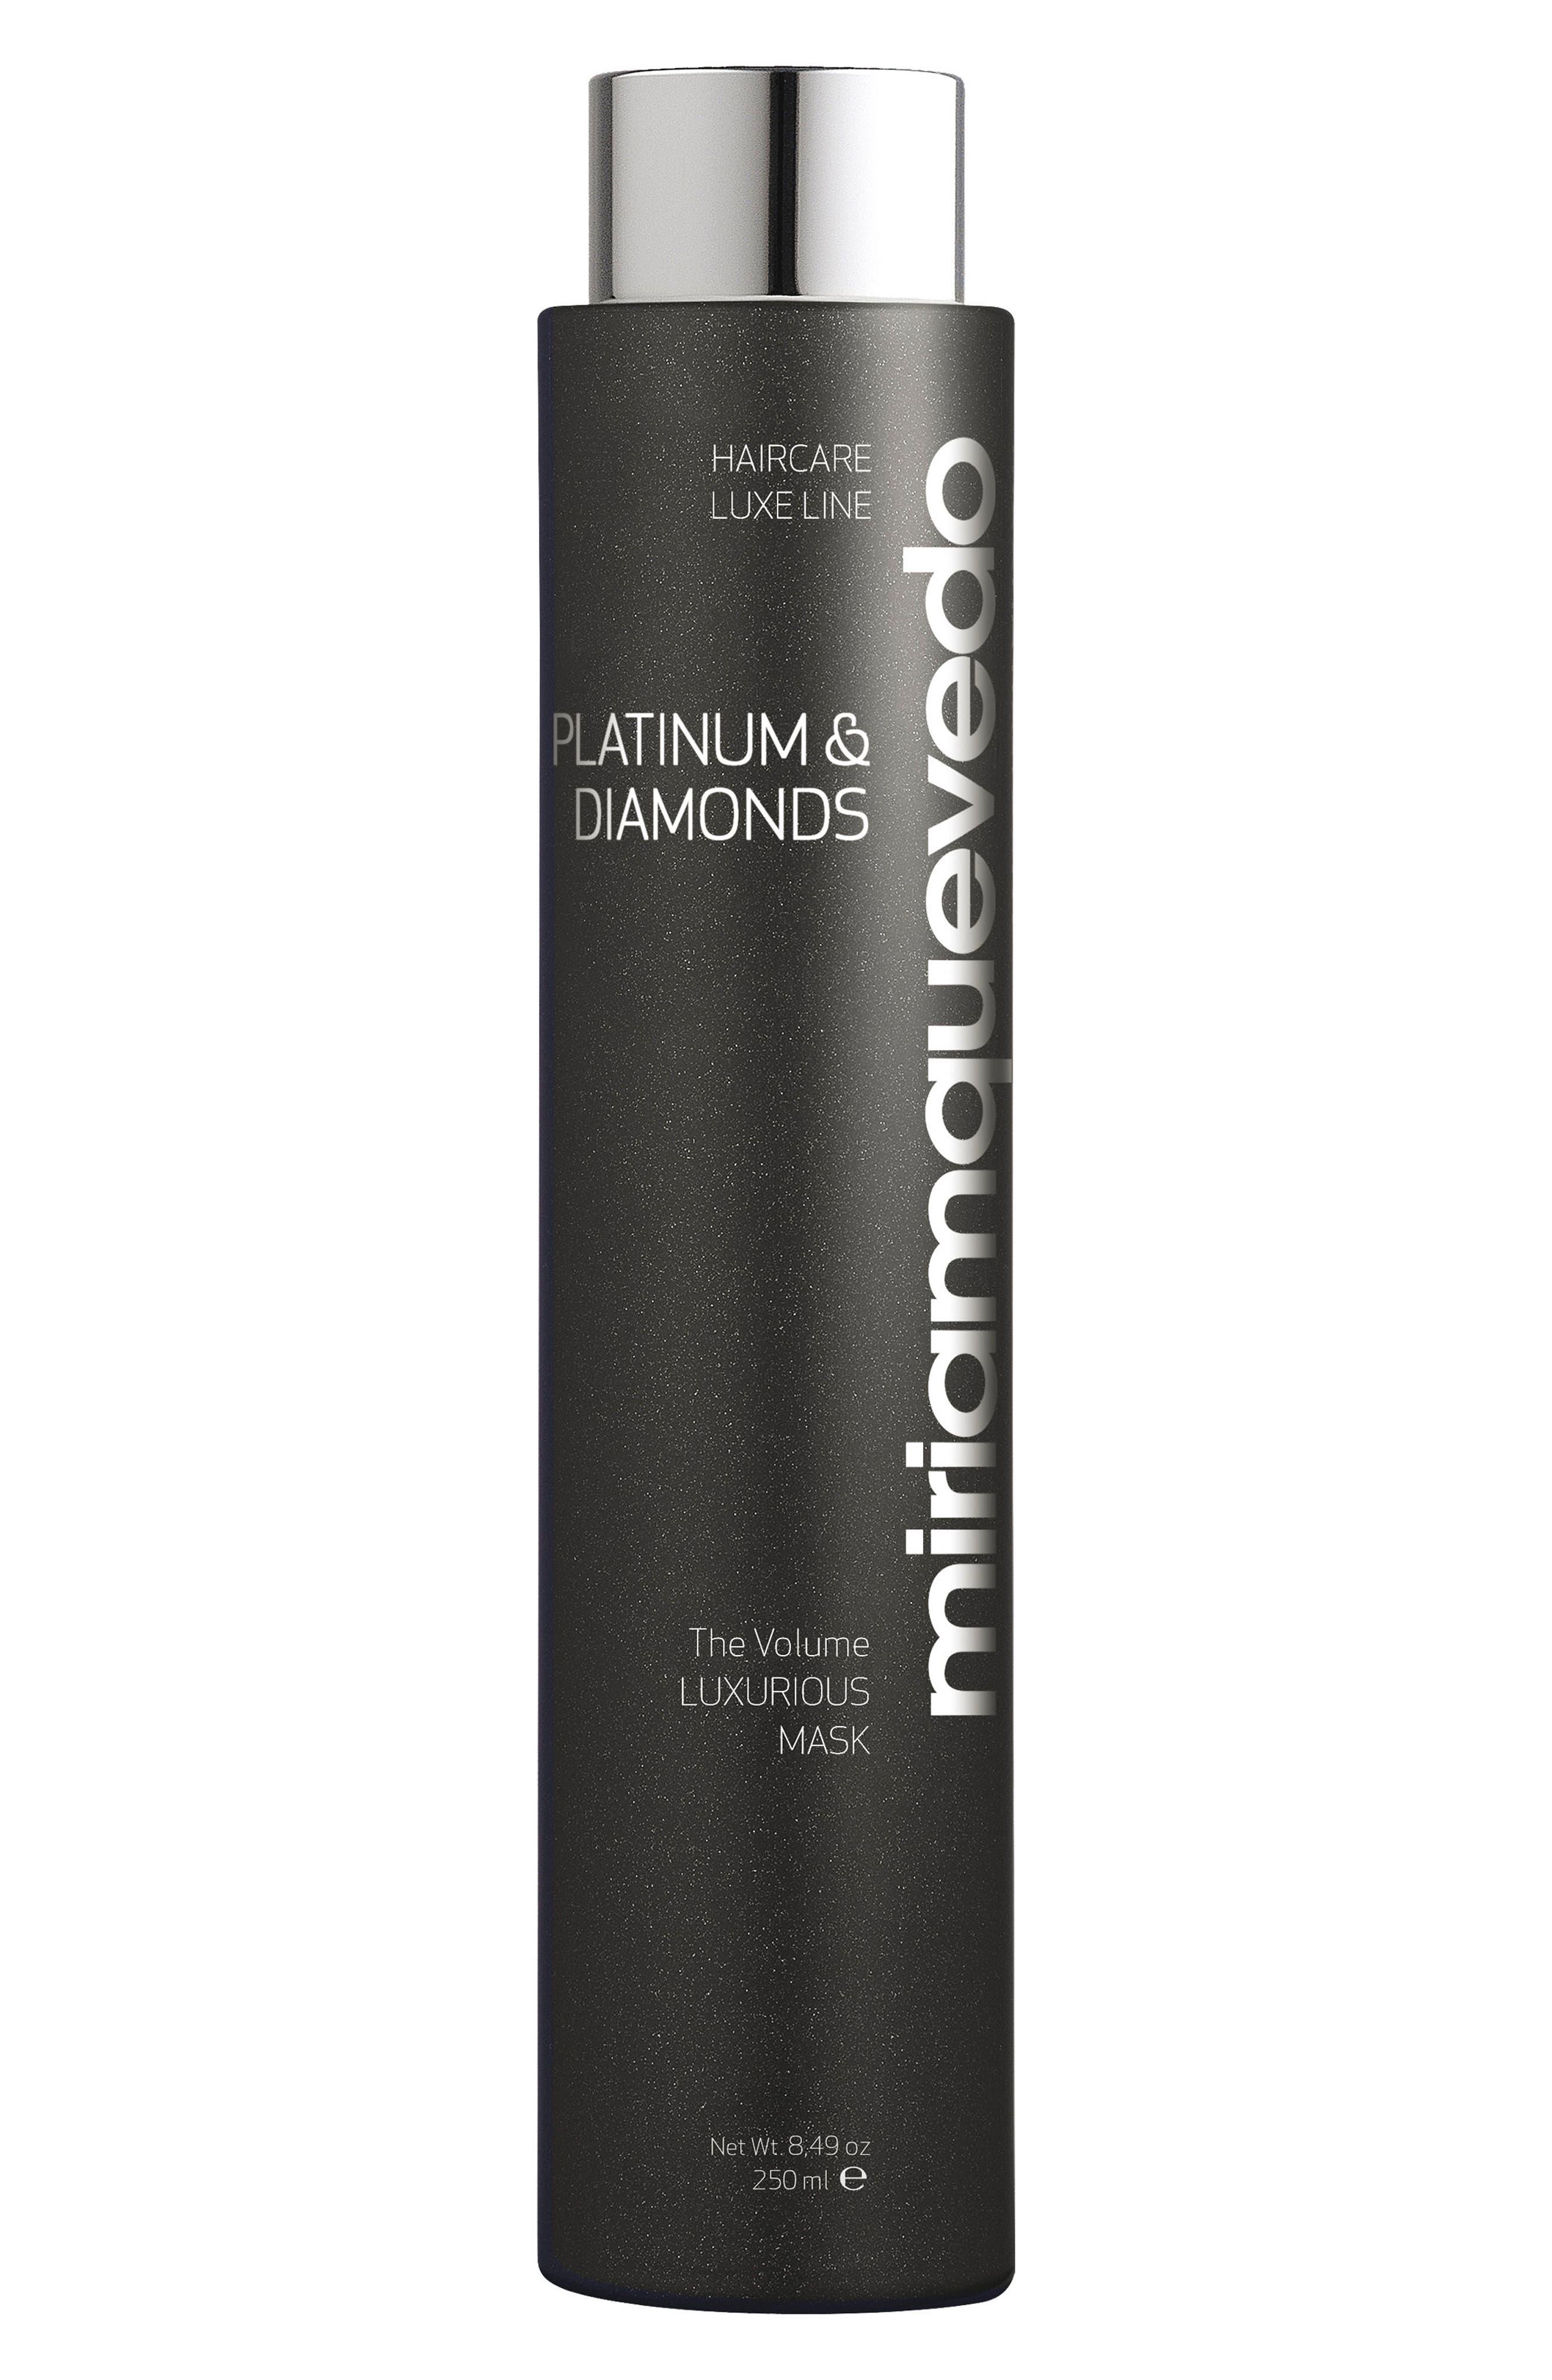 Alternate Image 1 Selected - SPACE.NK.apothecary Miriam Quevedo Platinum & Diamonds Luxurious Volume Hair Mask